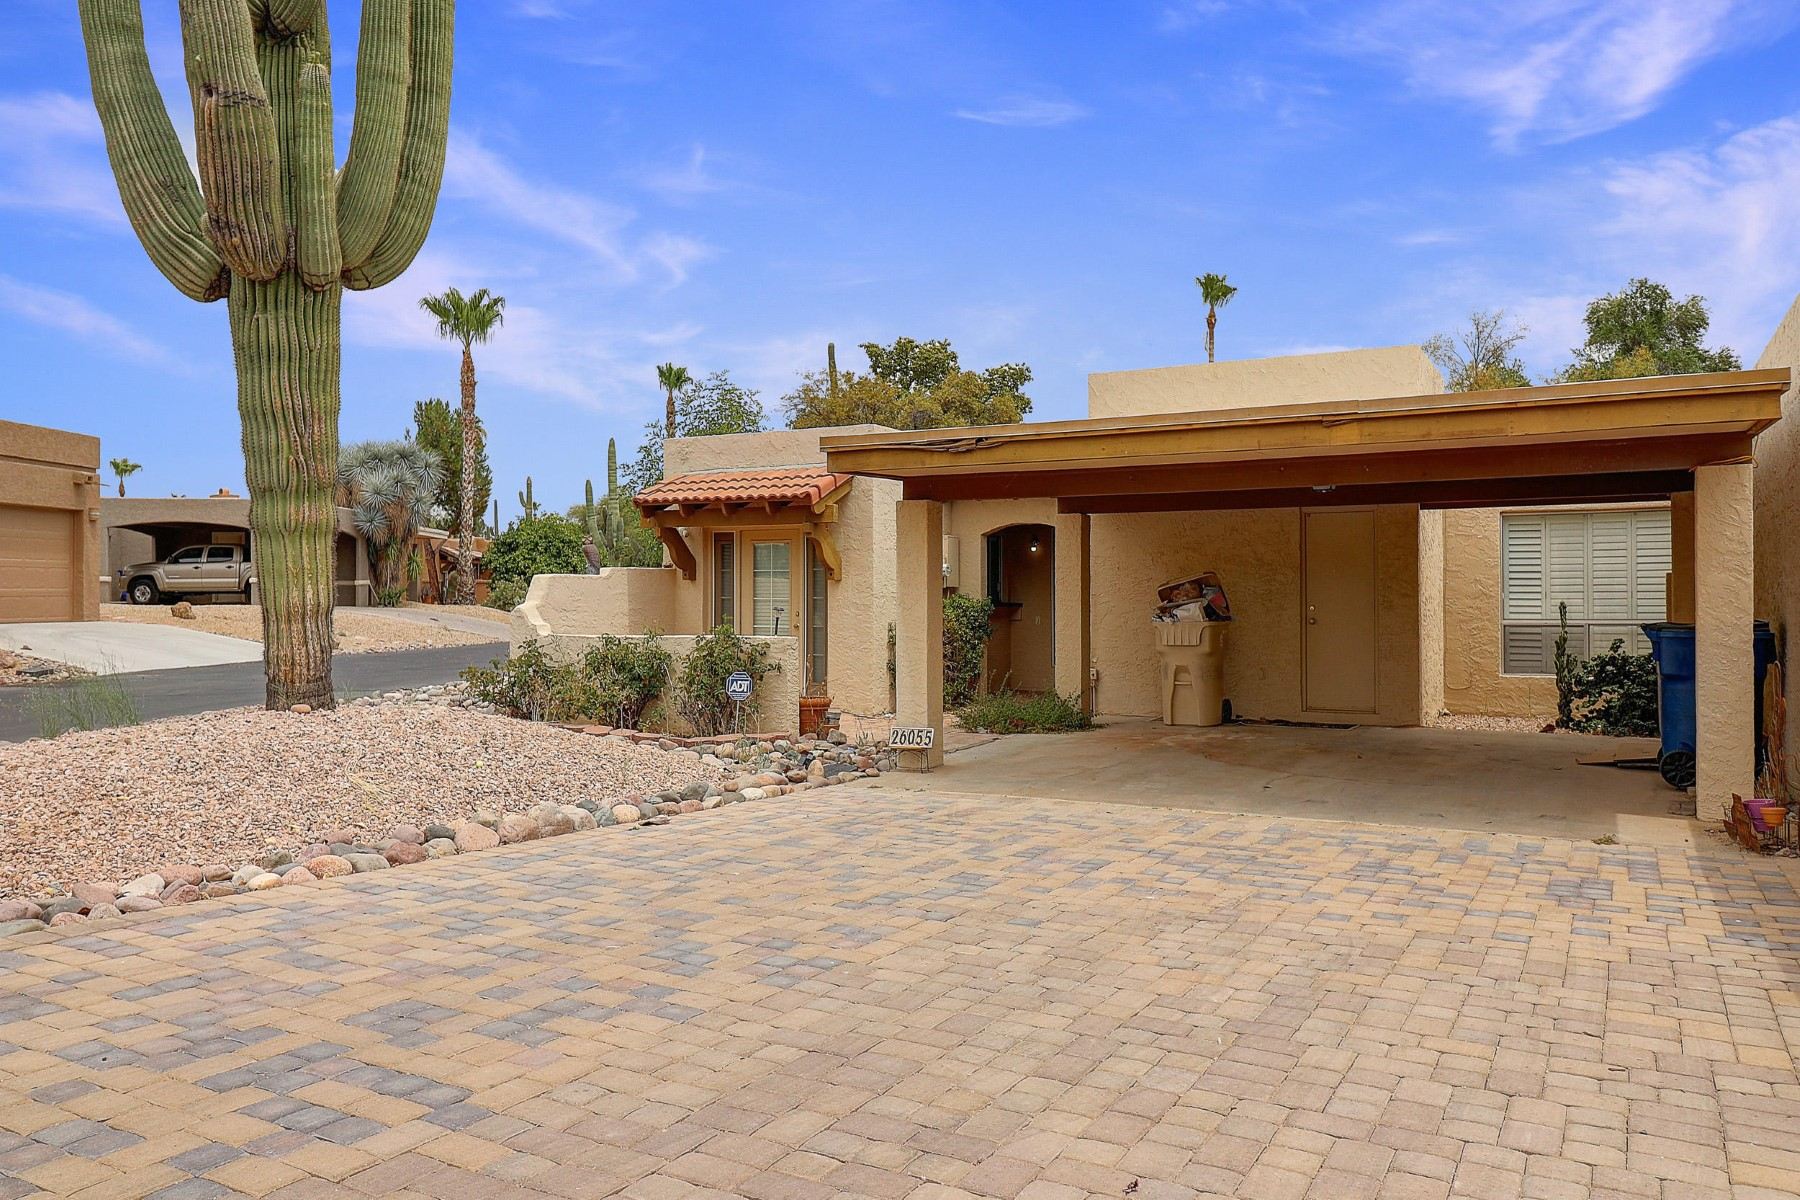 townhouses for Sale at Rio Verde 26055 N BRAVO LN Rio Verde, Arizona 85263 United States